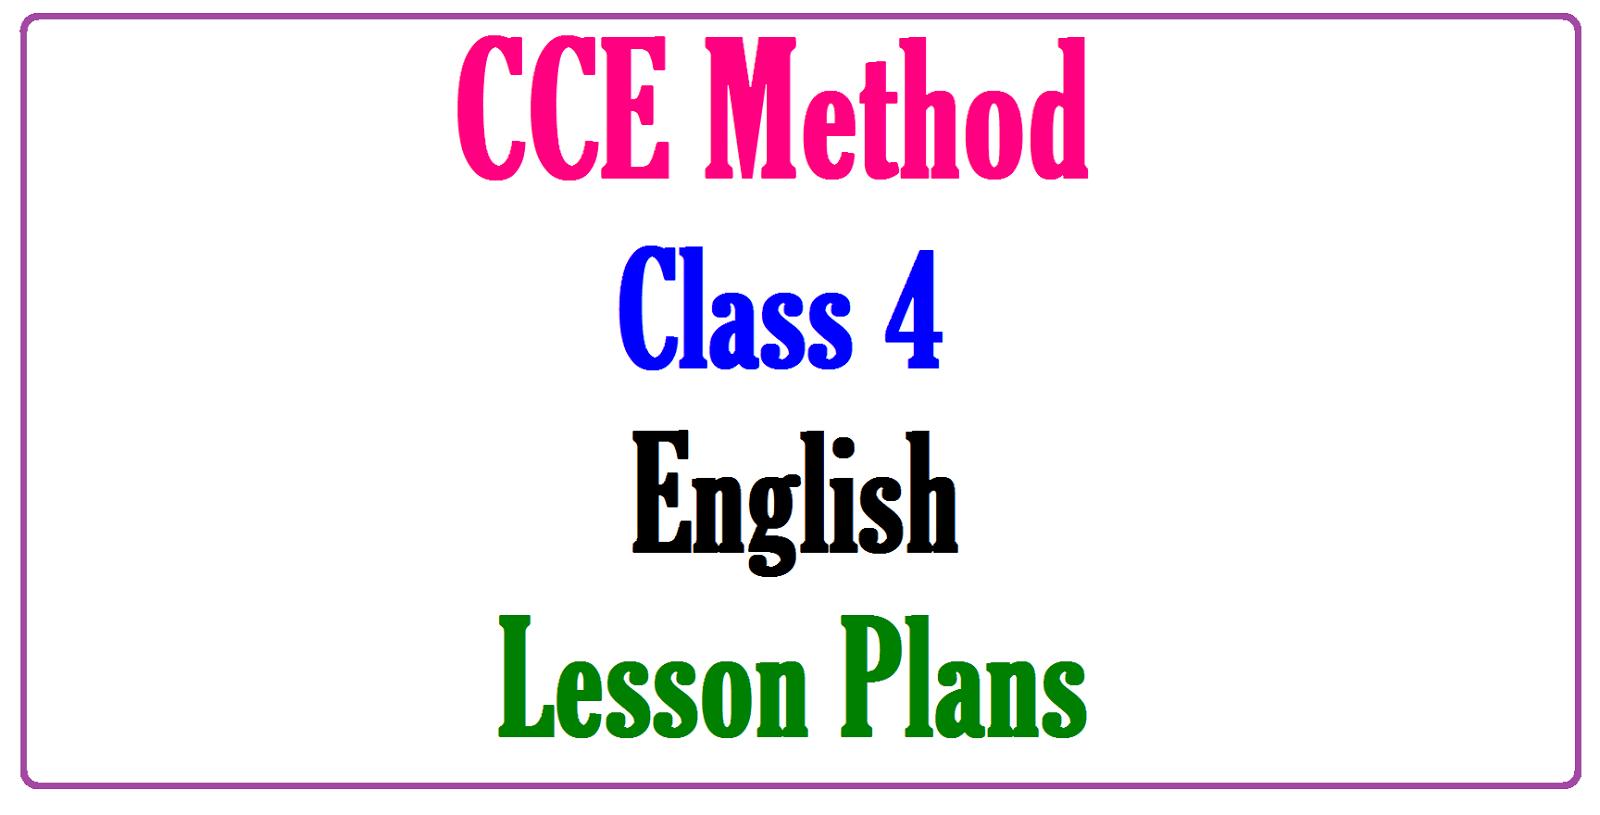 Evs Worksheet Class 1 Kvs Printable Worksheets And Activities For Teachers Parents Tutors And Homeschool Families